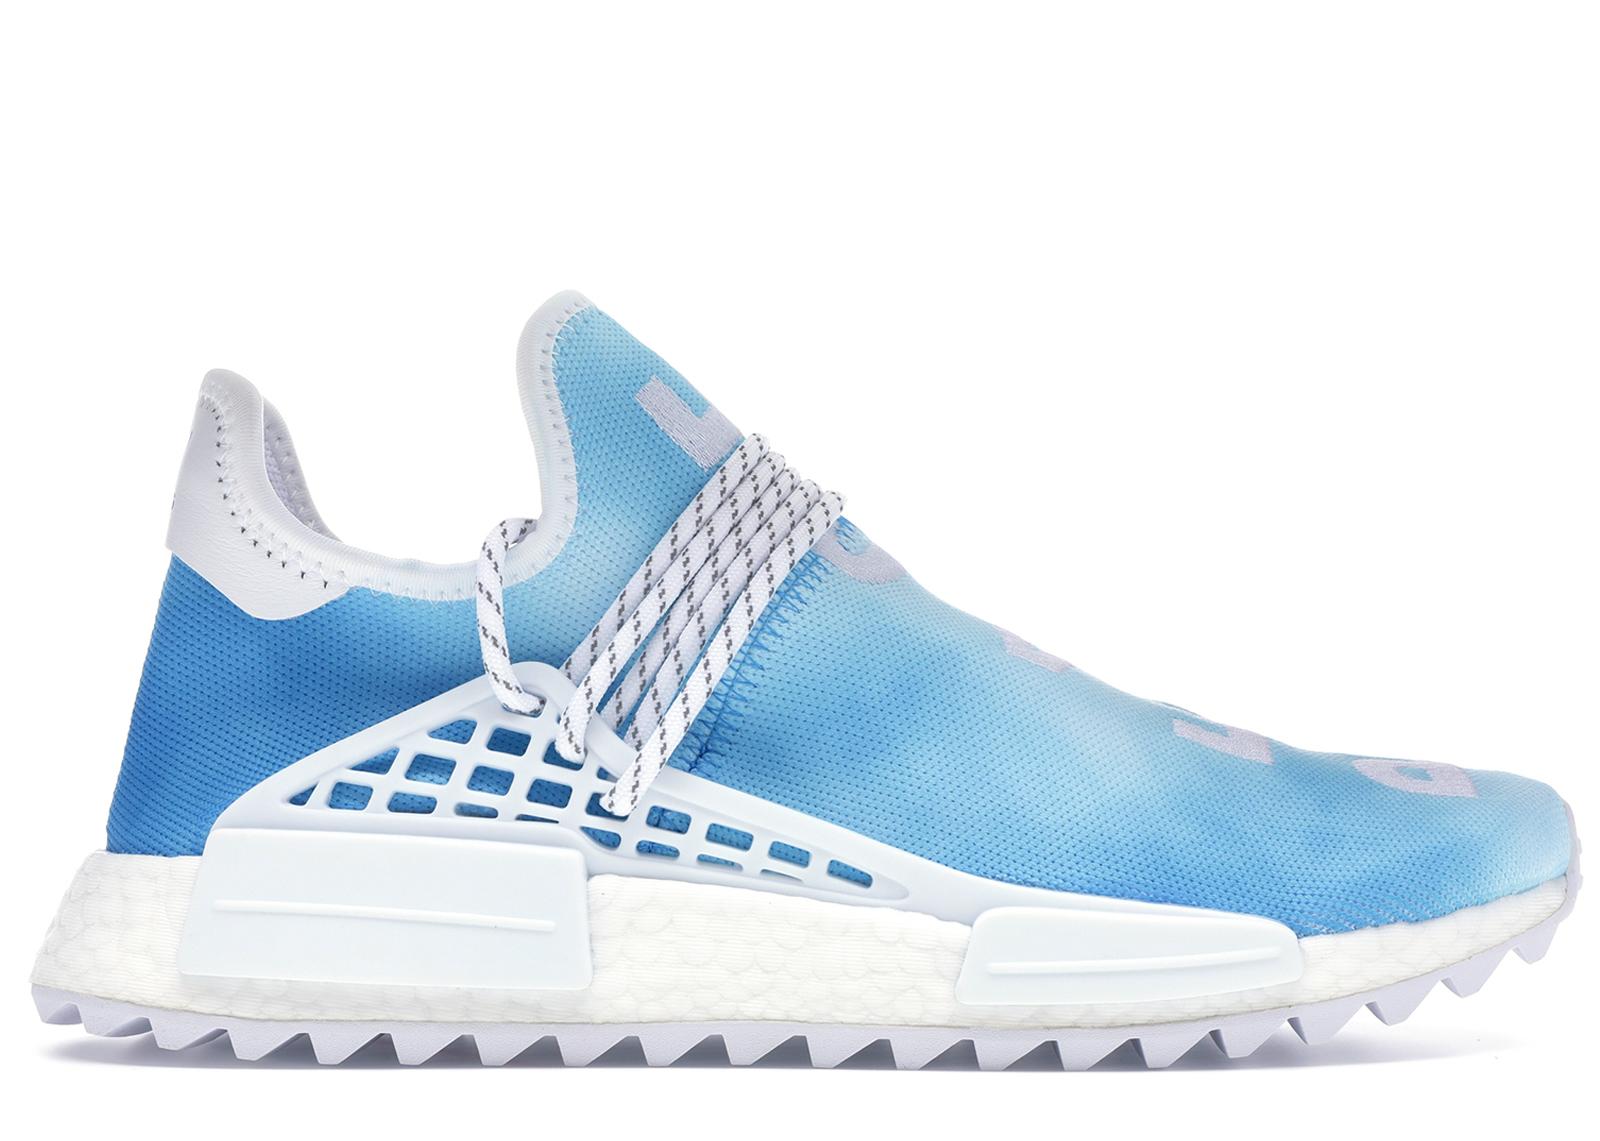 Buy adidas NMD HU Shoes & Deadstock Sneakers